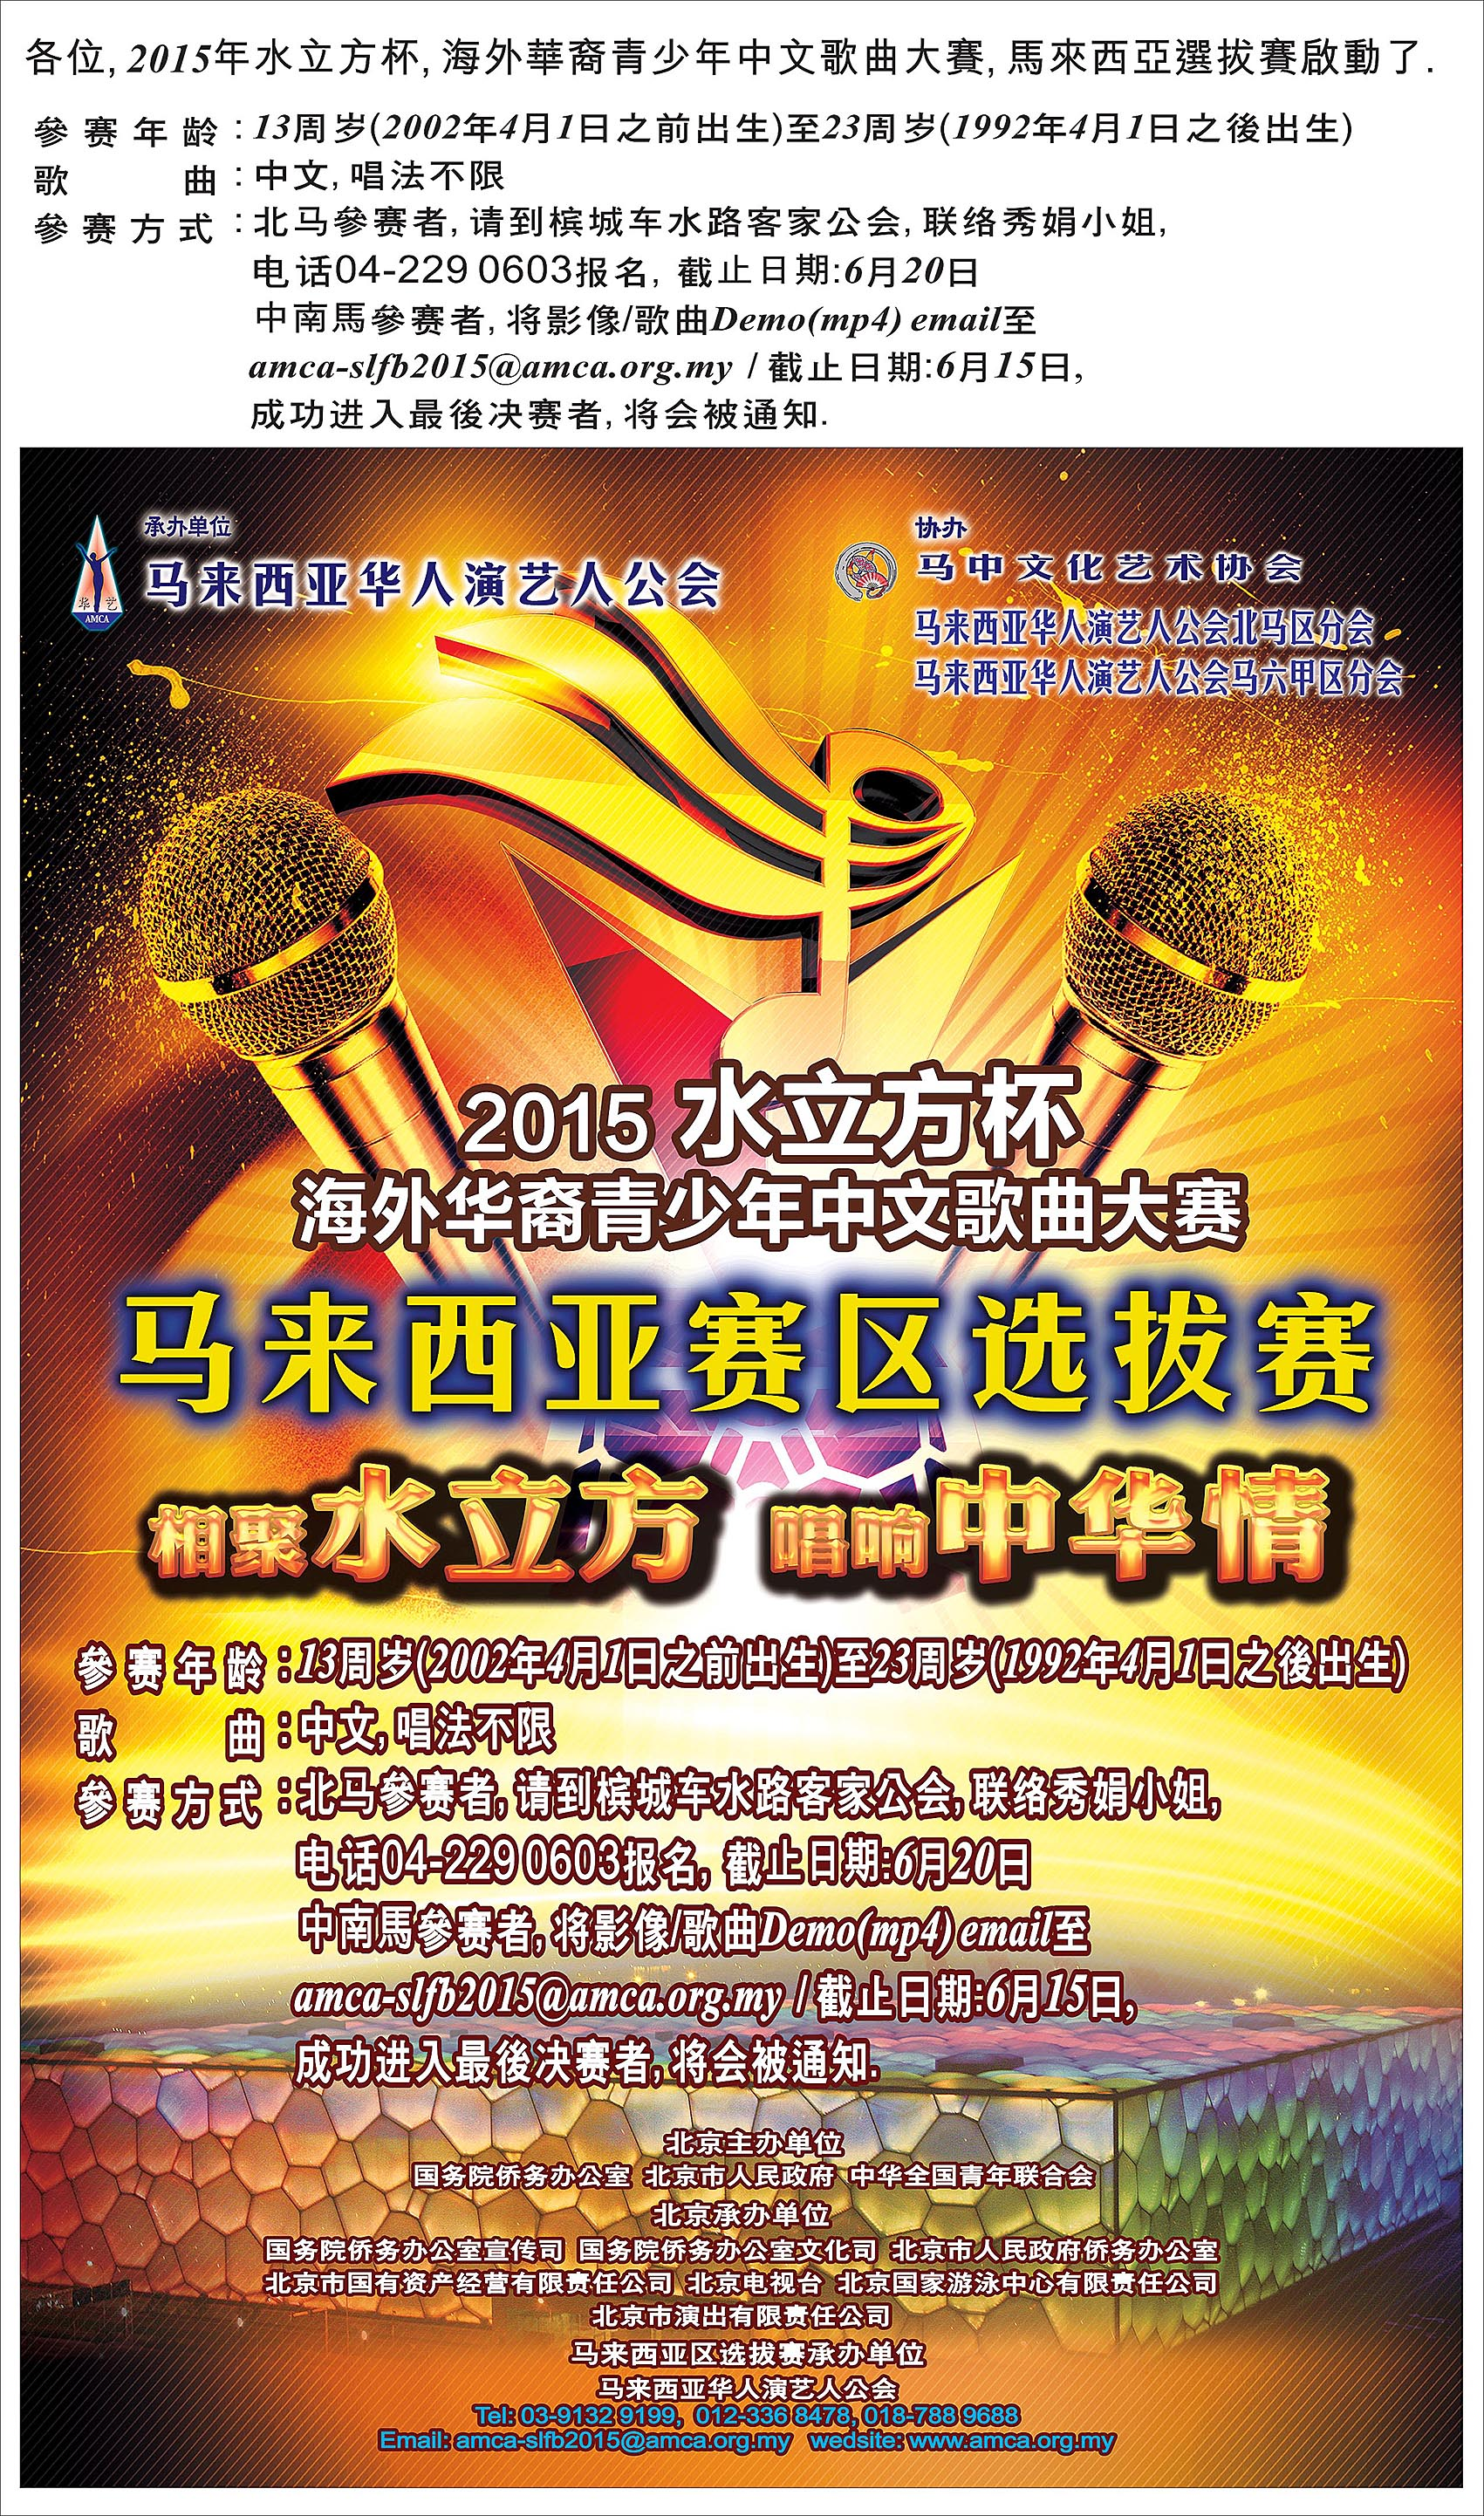 水立方杯2015 poster 选拔赛WEBSITE (1)PENANG